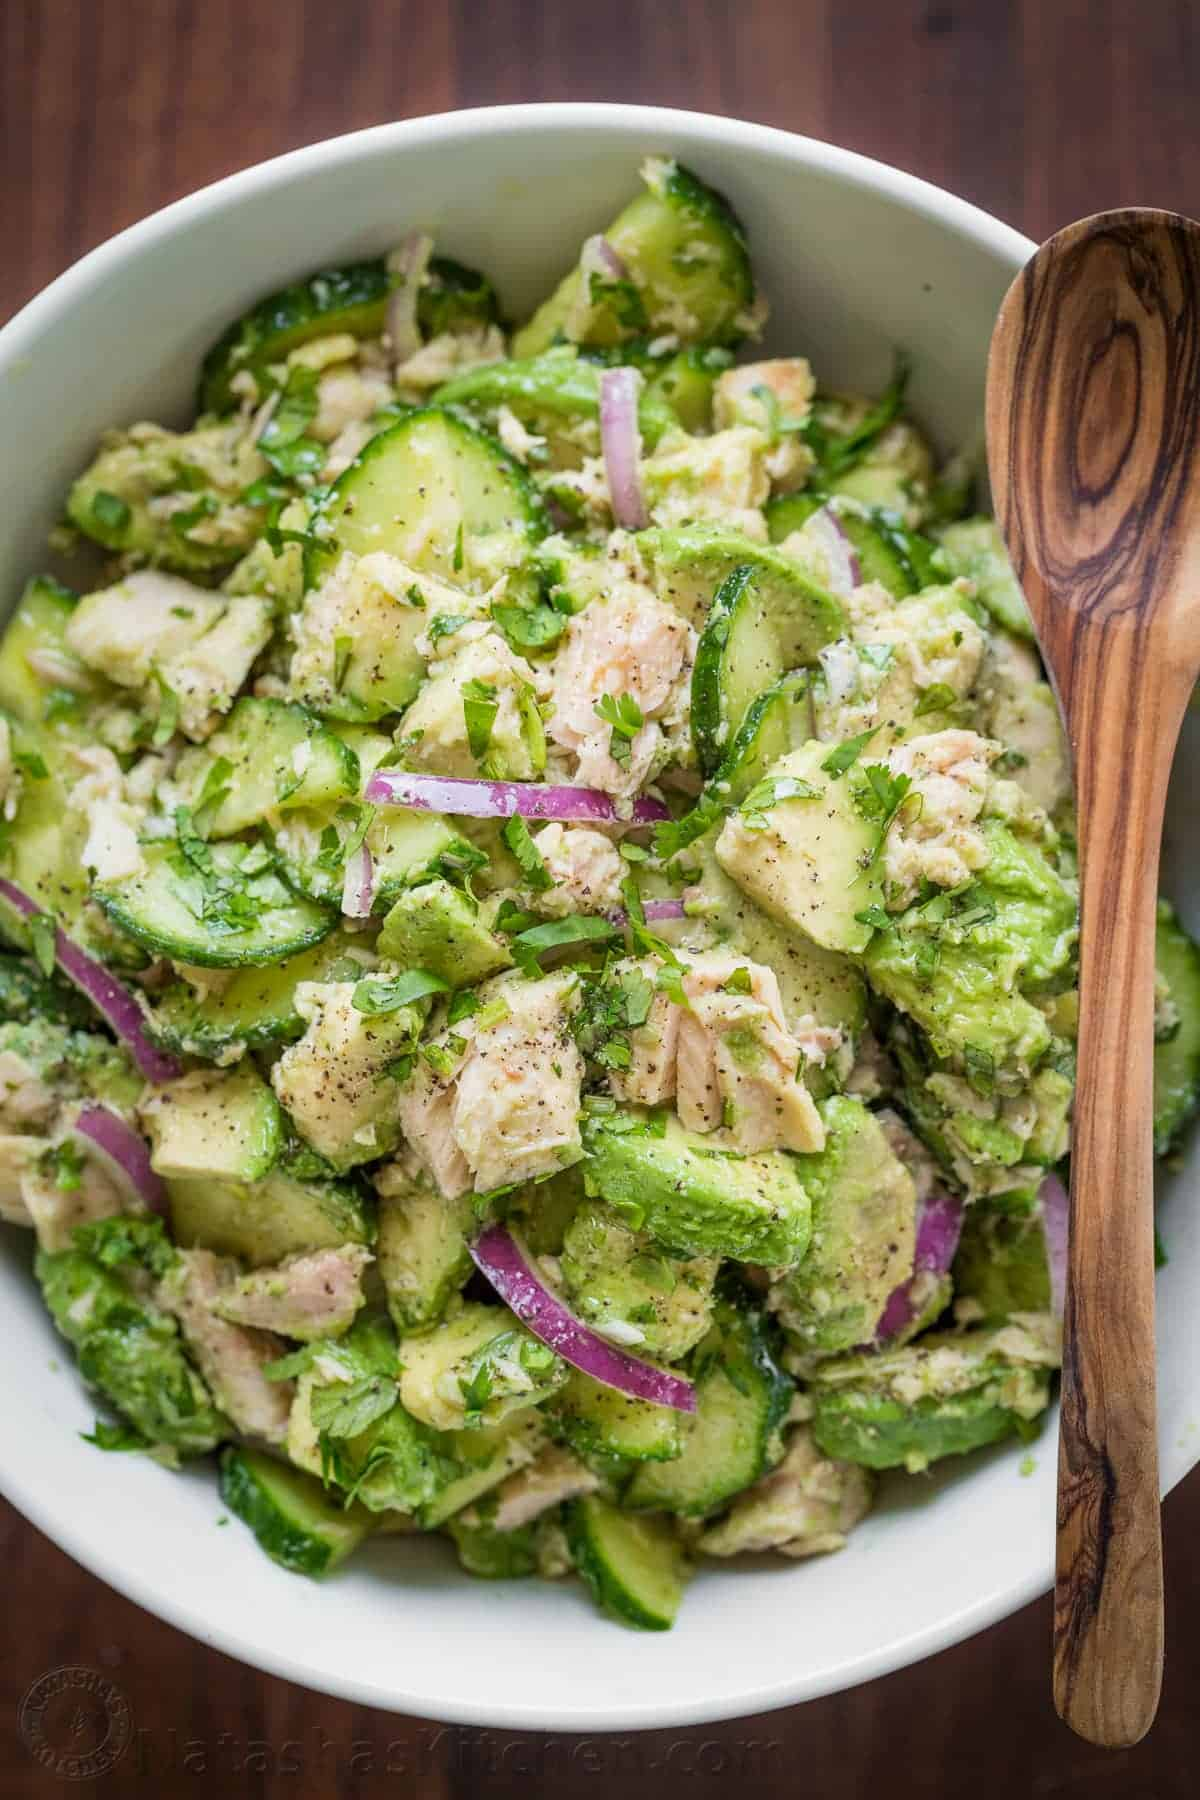 Avocado tuna salad recipe video for Tuna fish salad recipe